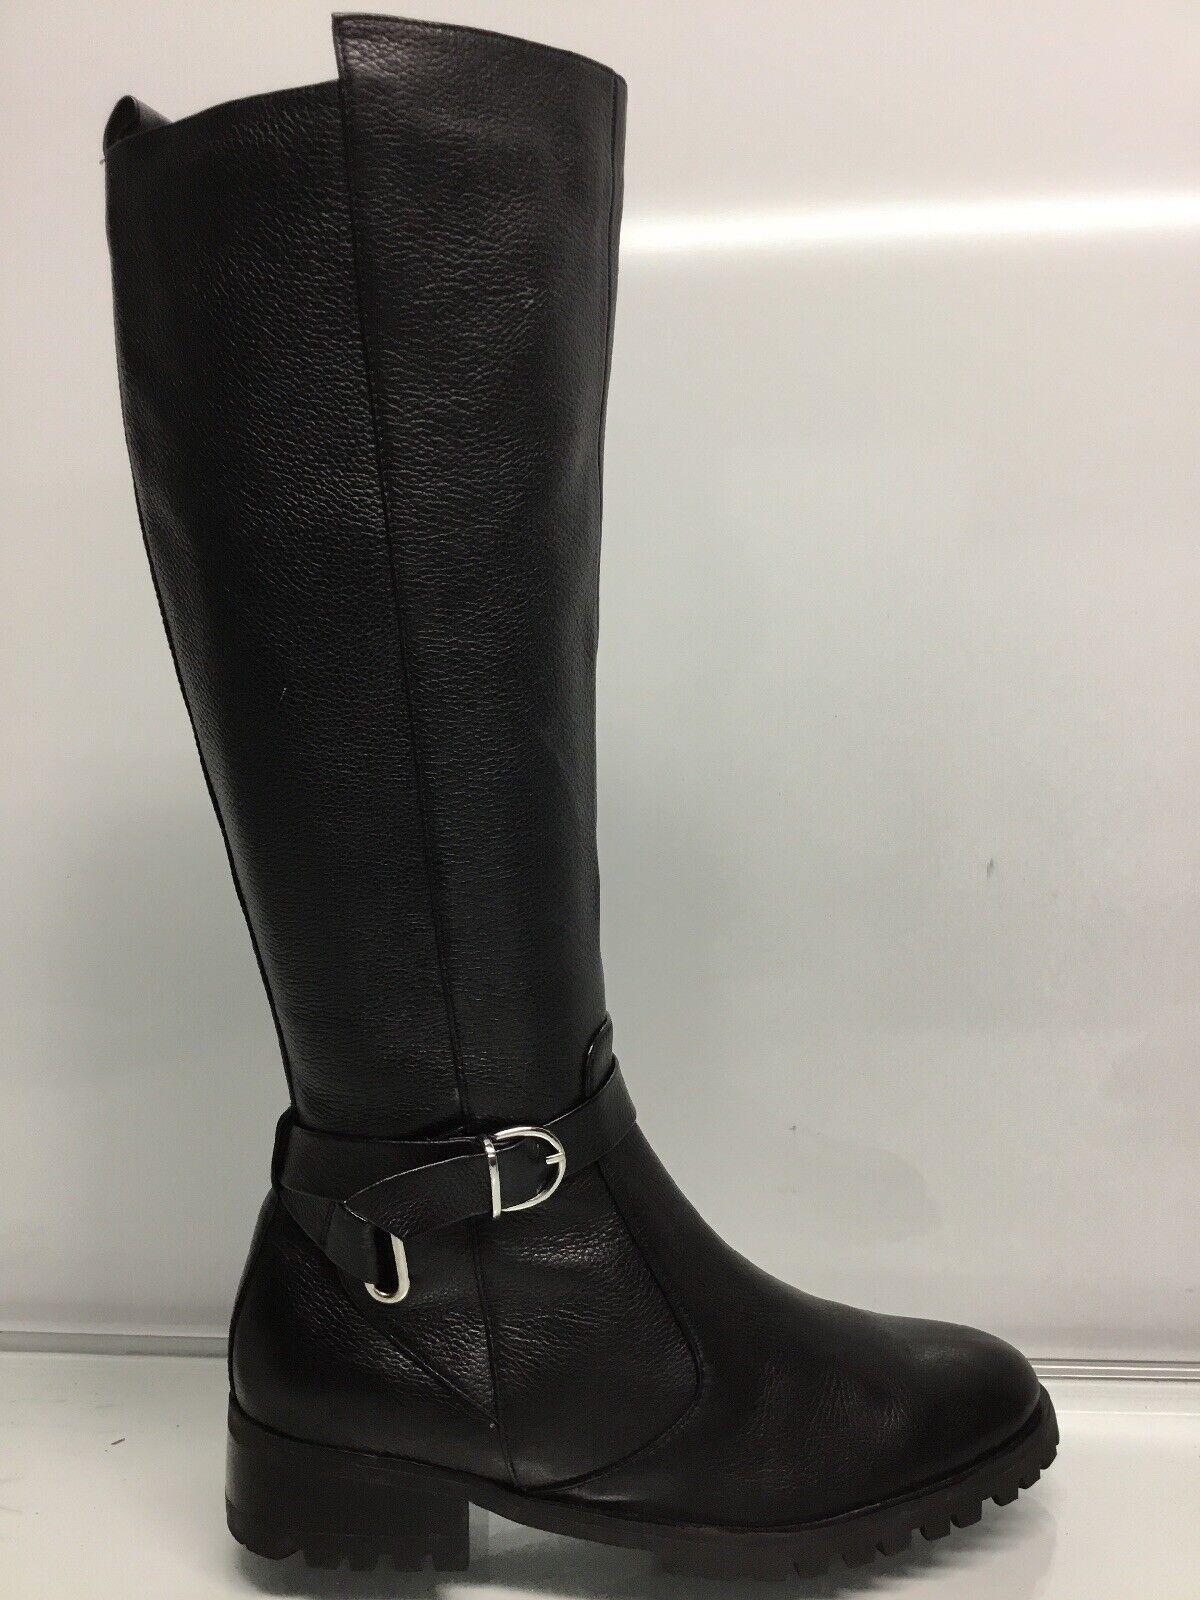 Tesori Riding Boots Valancia Black Leather Tall Size 6M.*